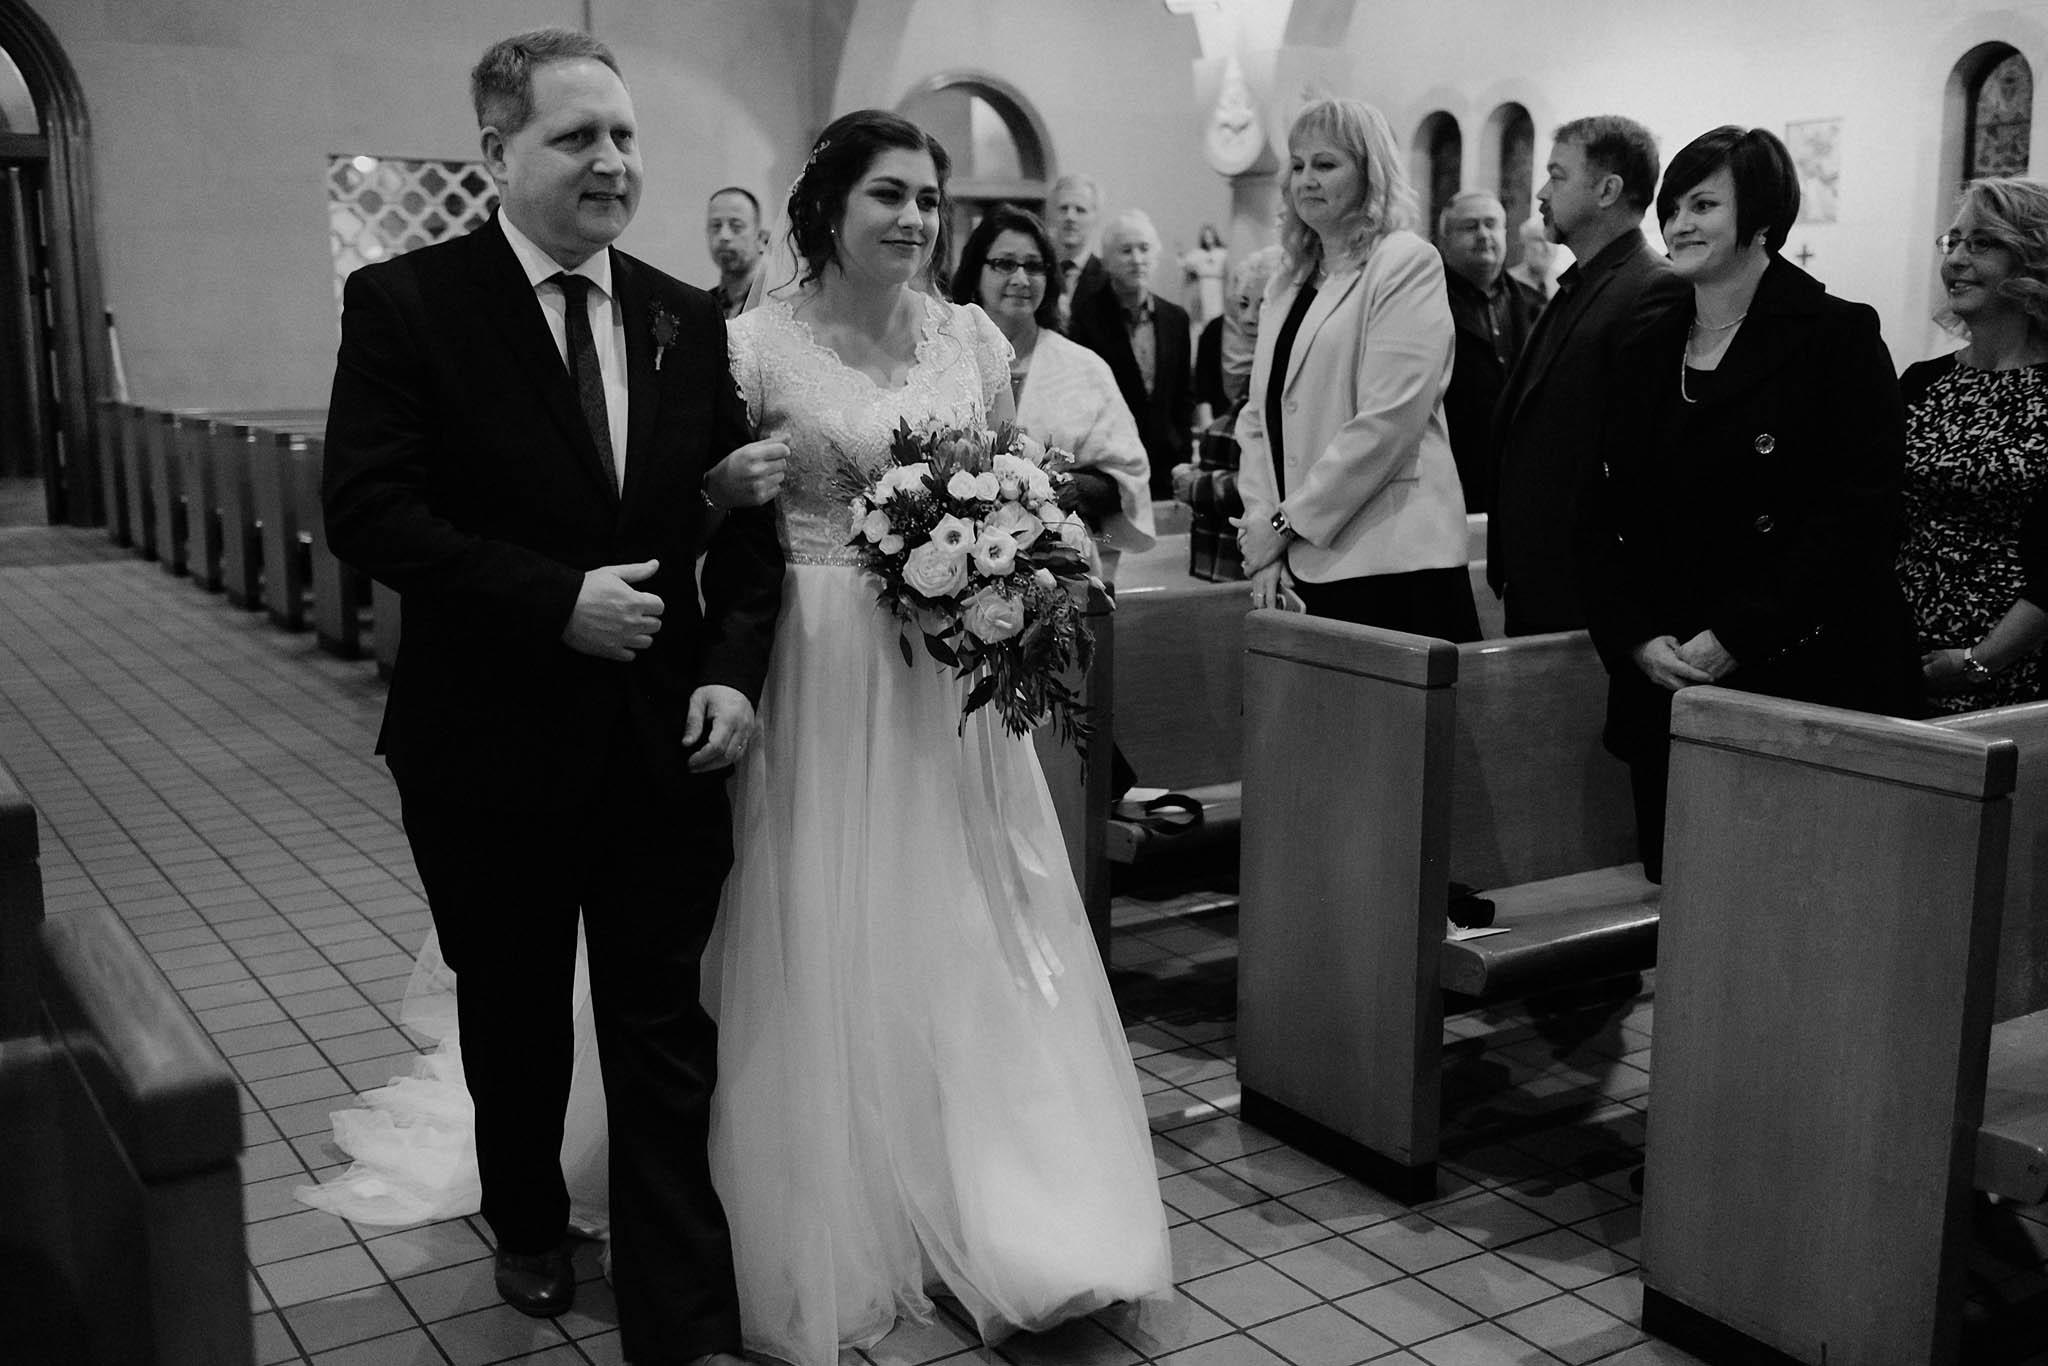 cincinnati warehouse wedding photographer cathedral church ceremony father walking bride down aisle